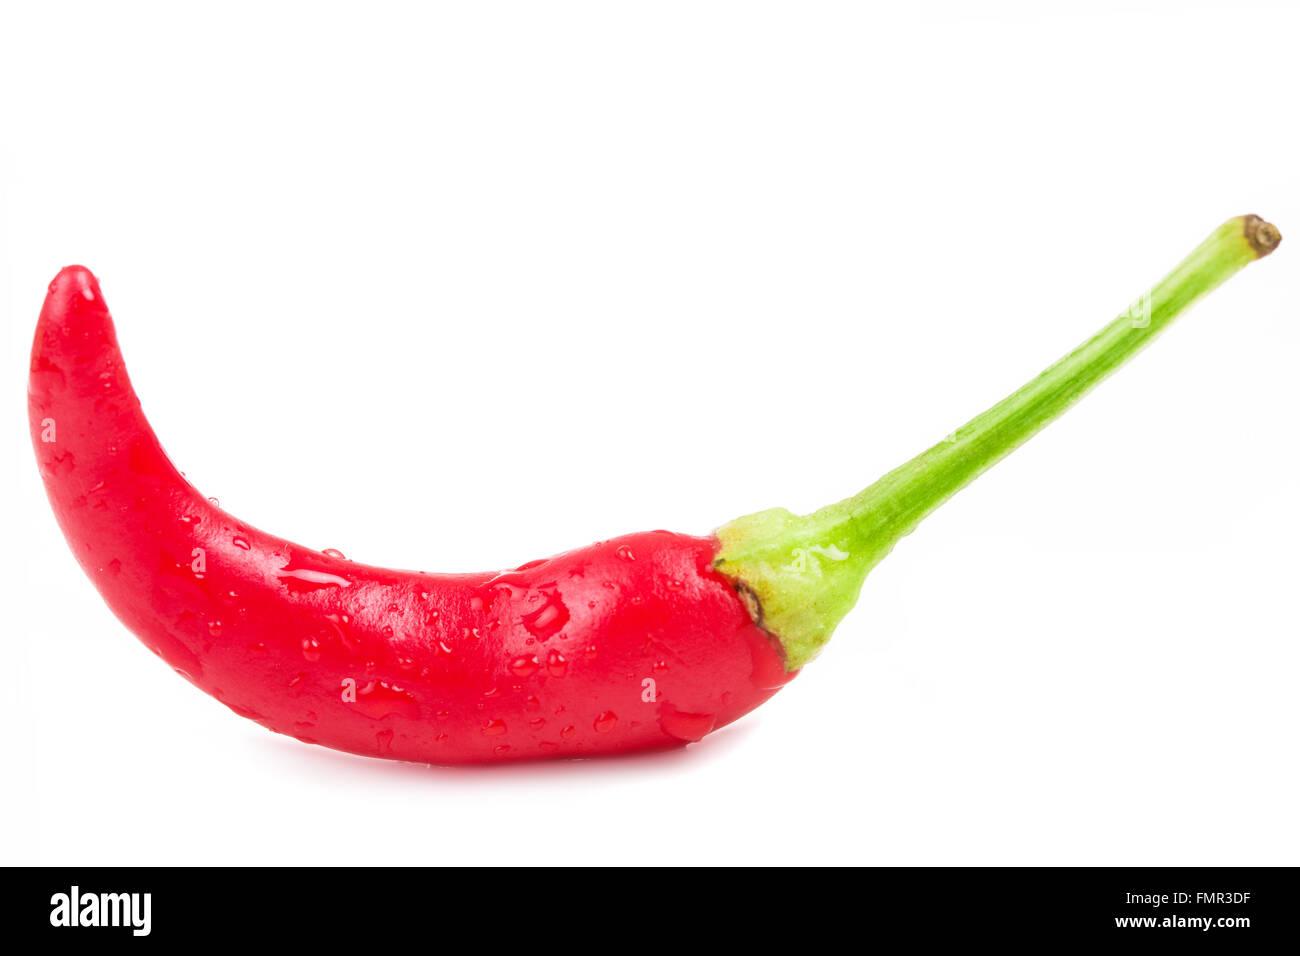 Chilli pepper on white background - Stock Image